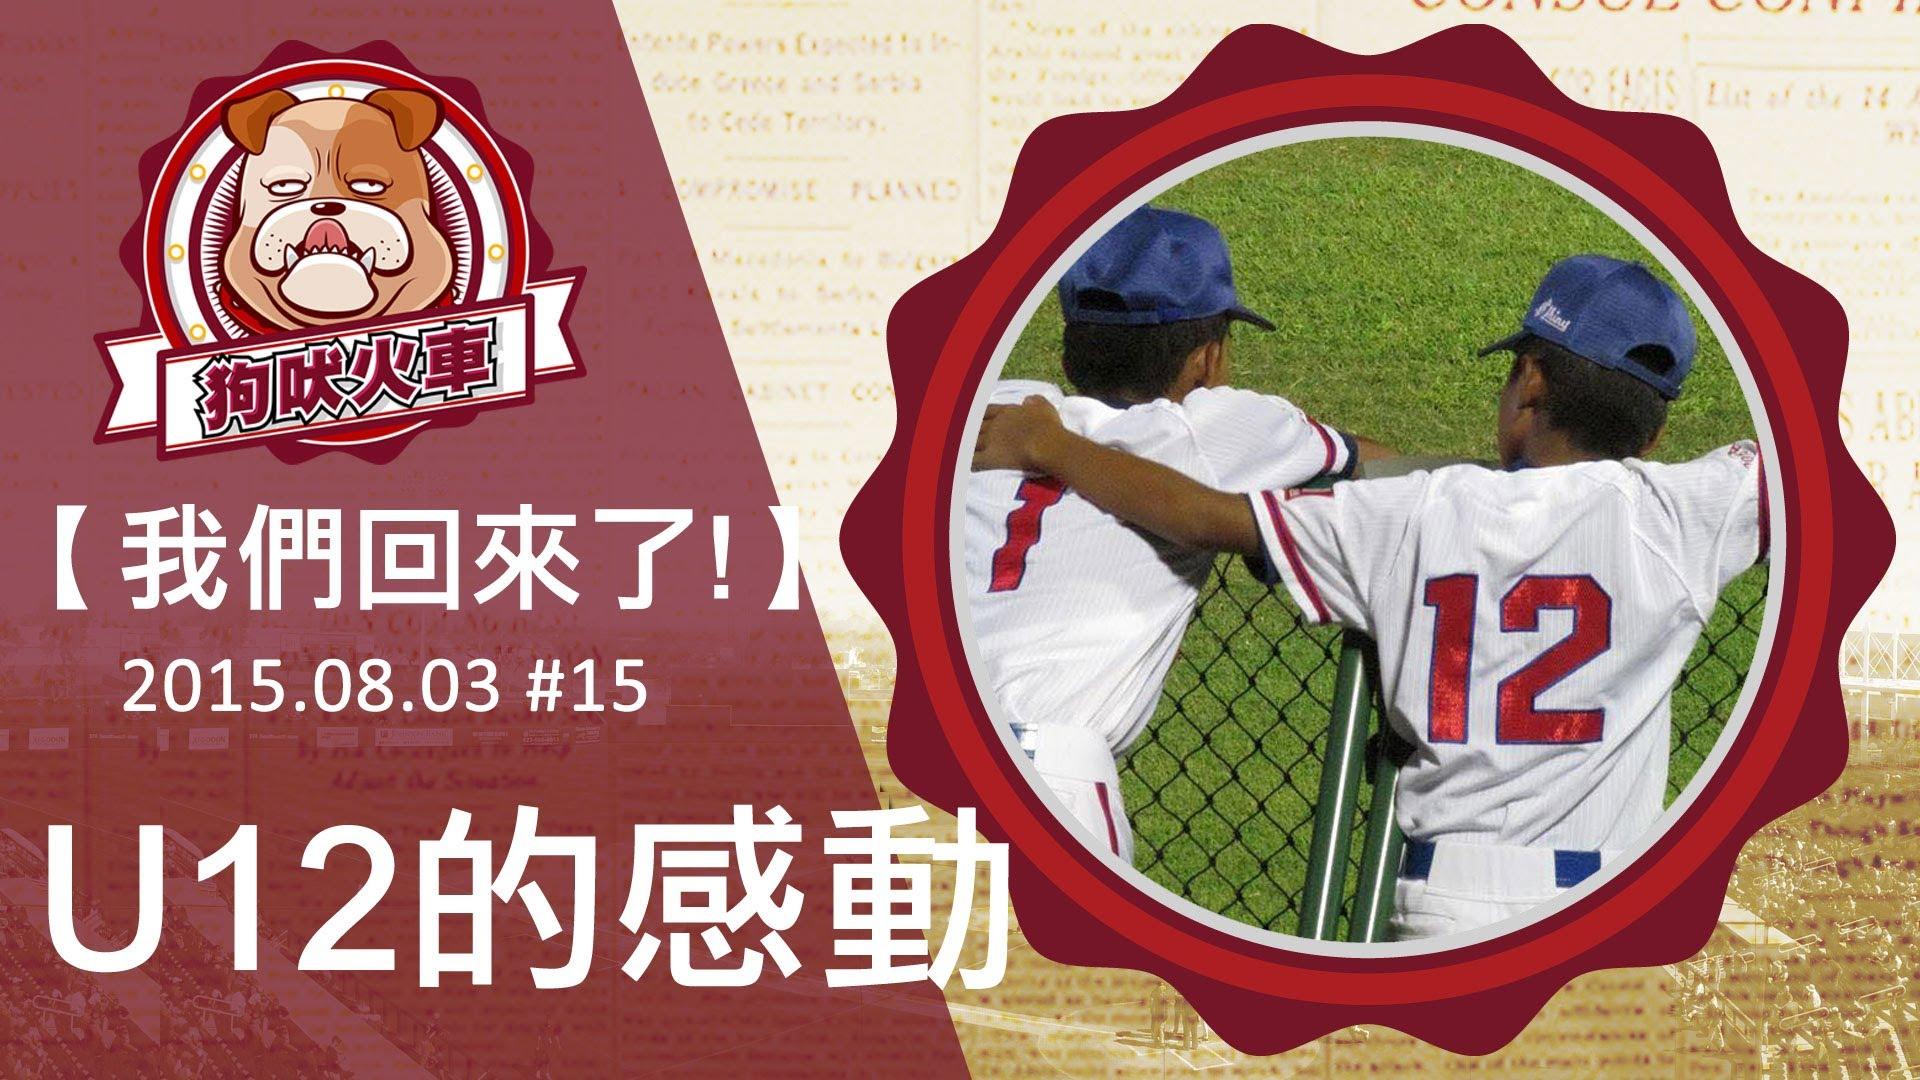 Vamos Sports 狗吠火車#15-我們回來了!U12的感動